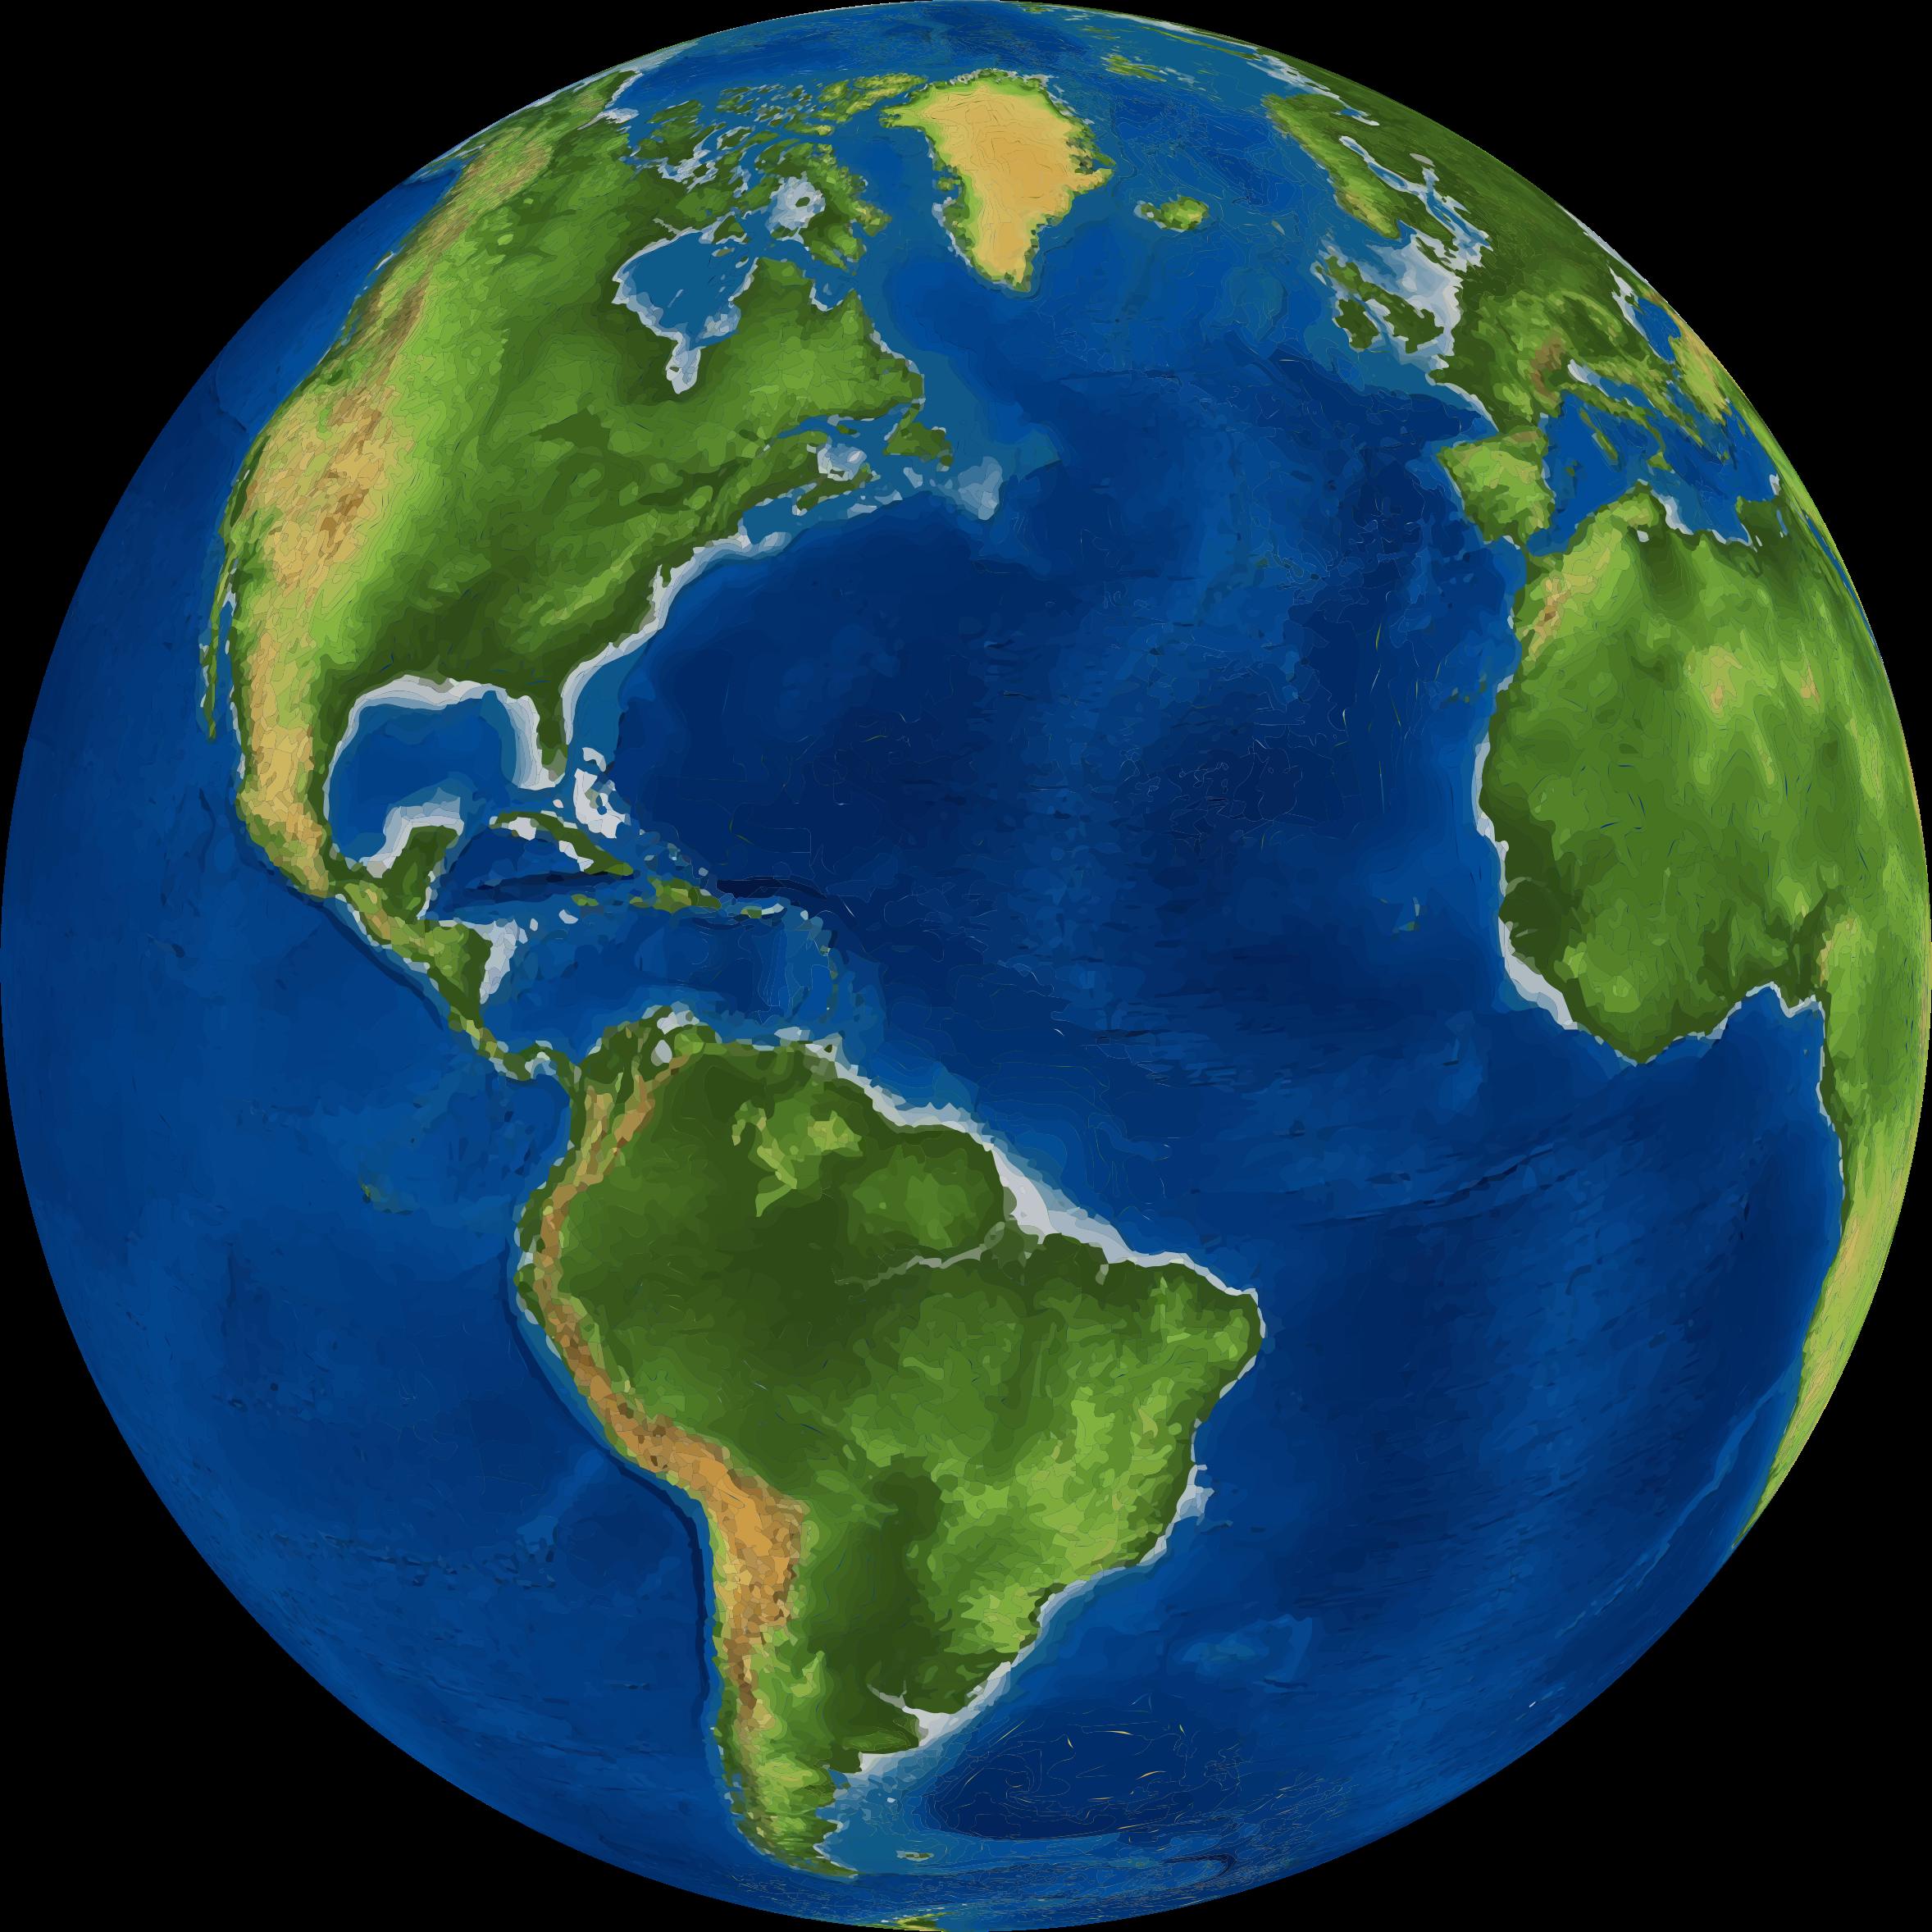 3d-earth-globe